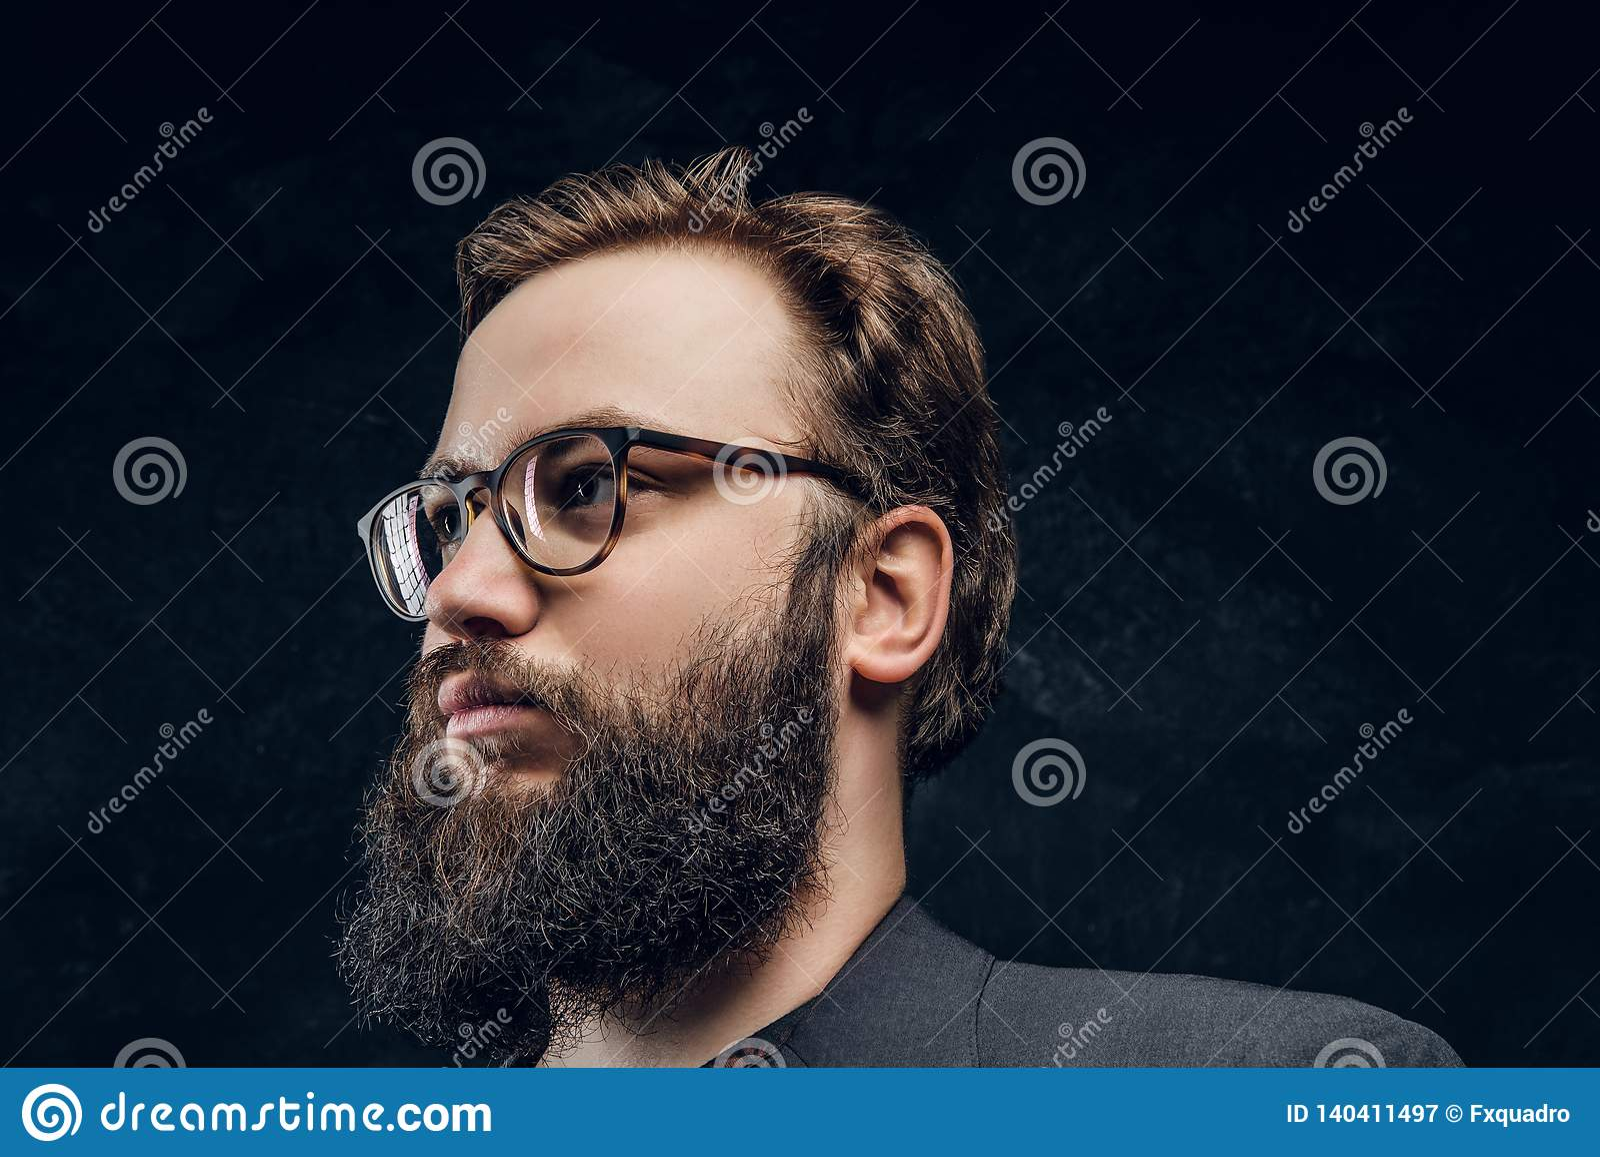 fe66679abcbd Portrait Of A Smart Bearded Man In Glasses In A Dark Studio Stock ...